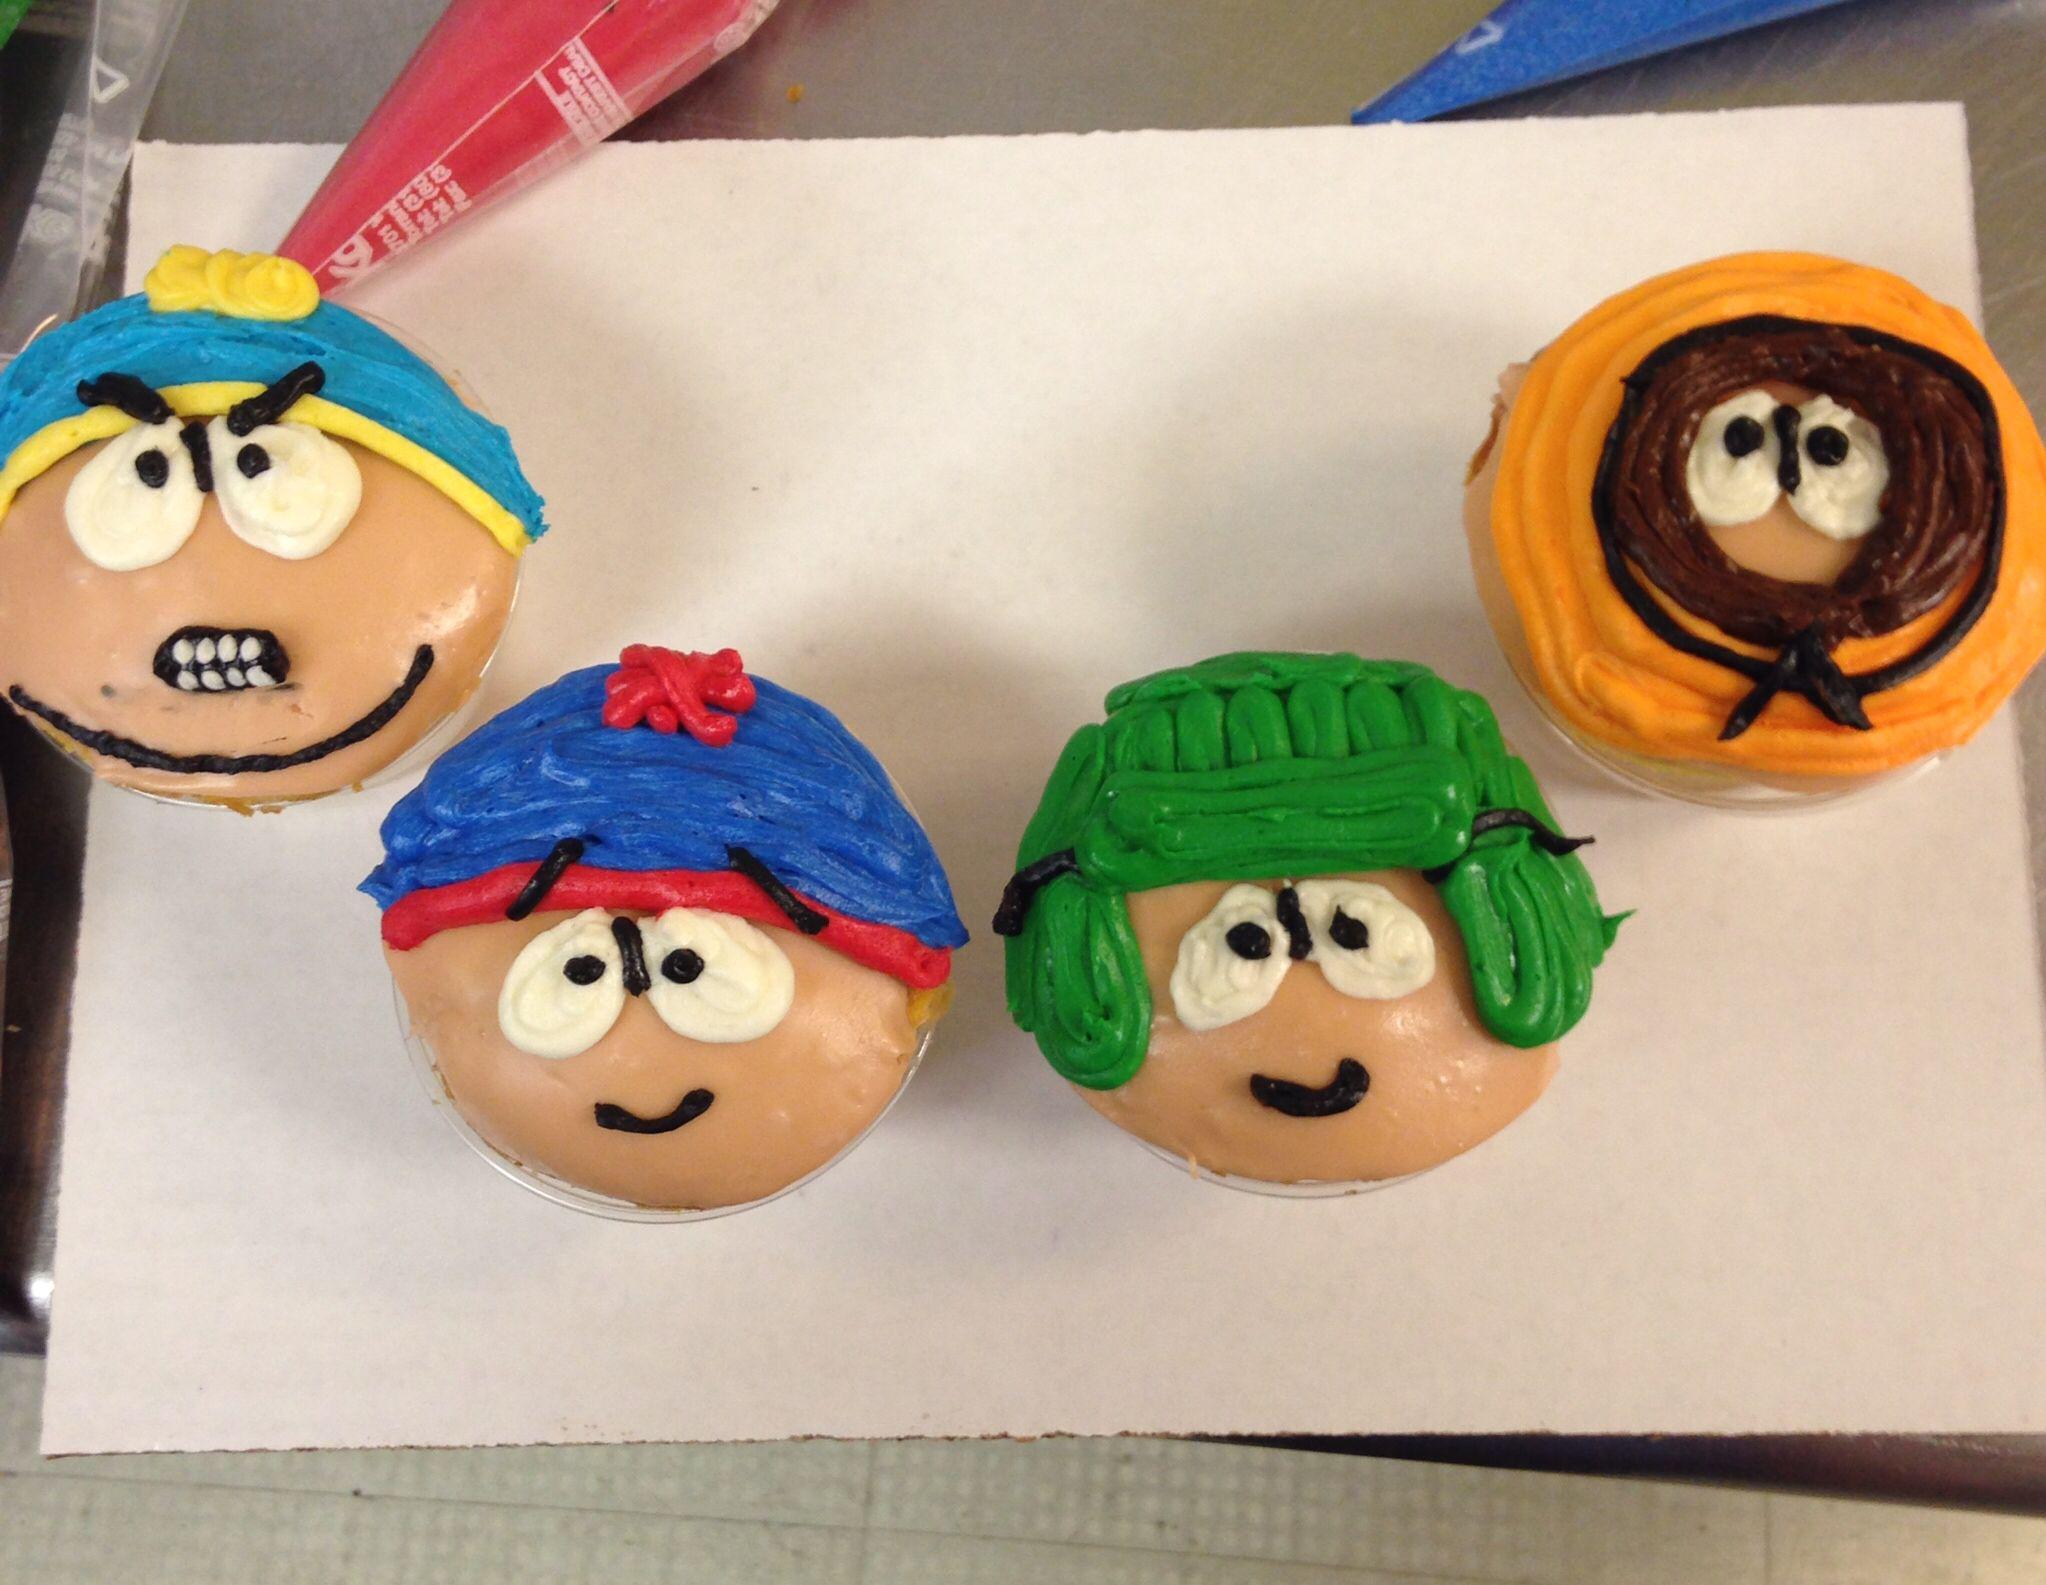 South Park cupcakes!